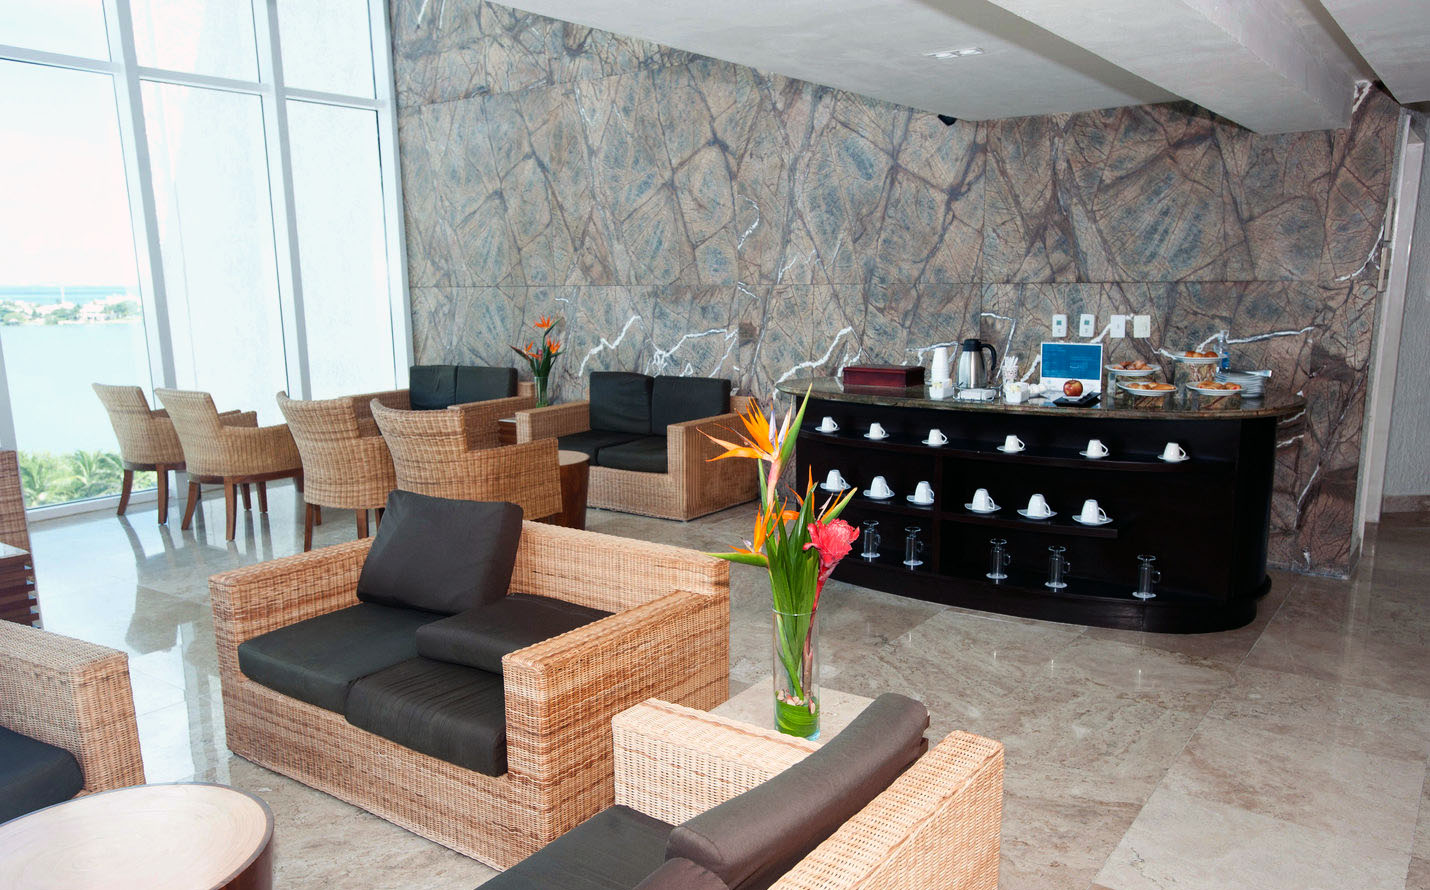 sky-lounge-v4388445